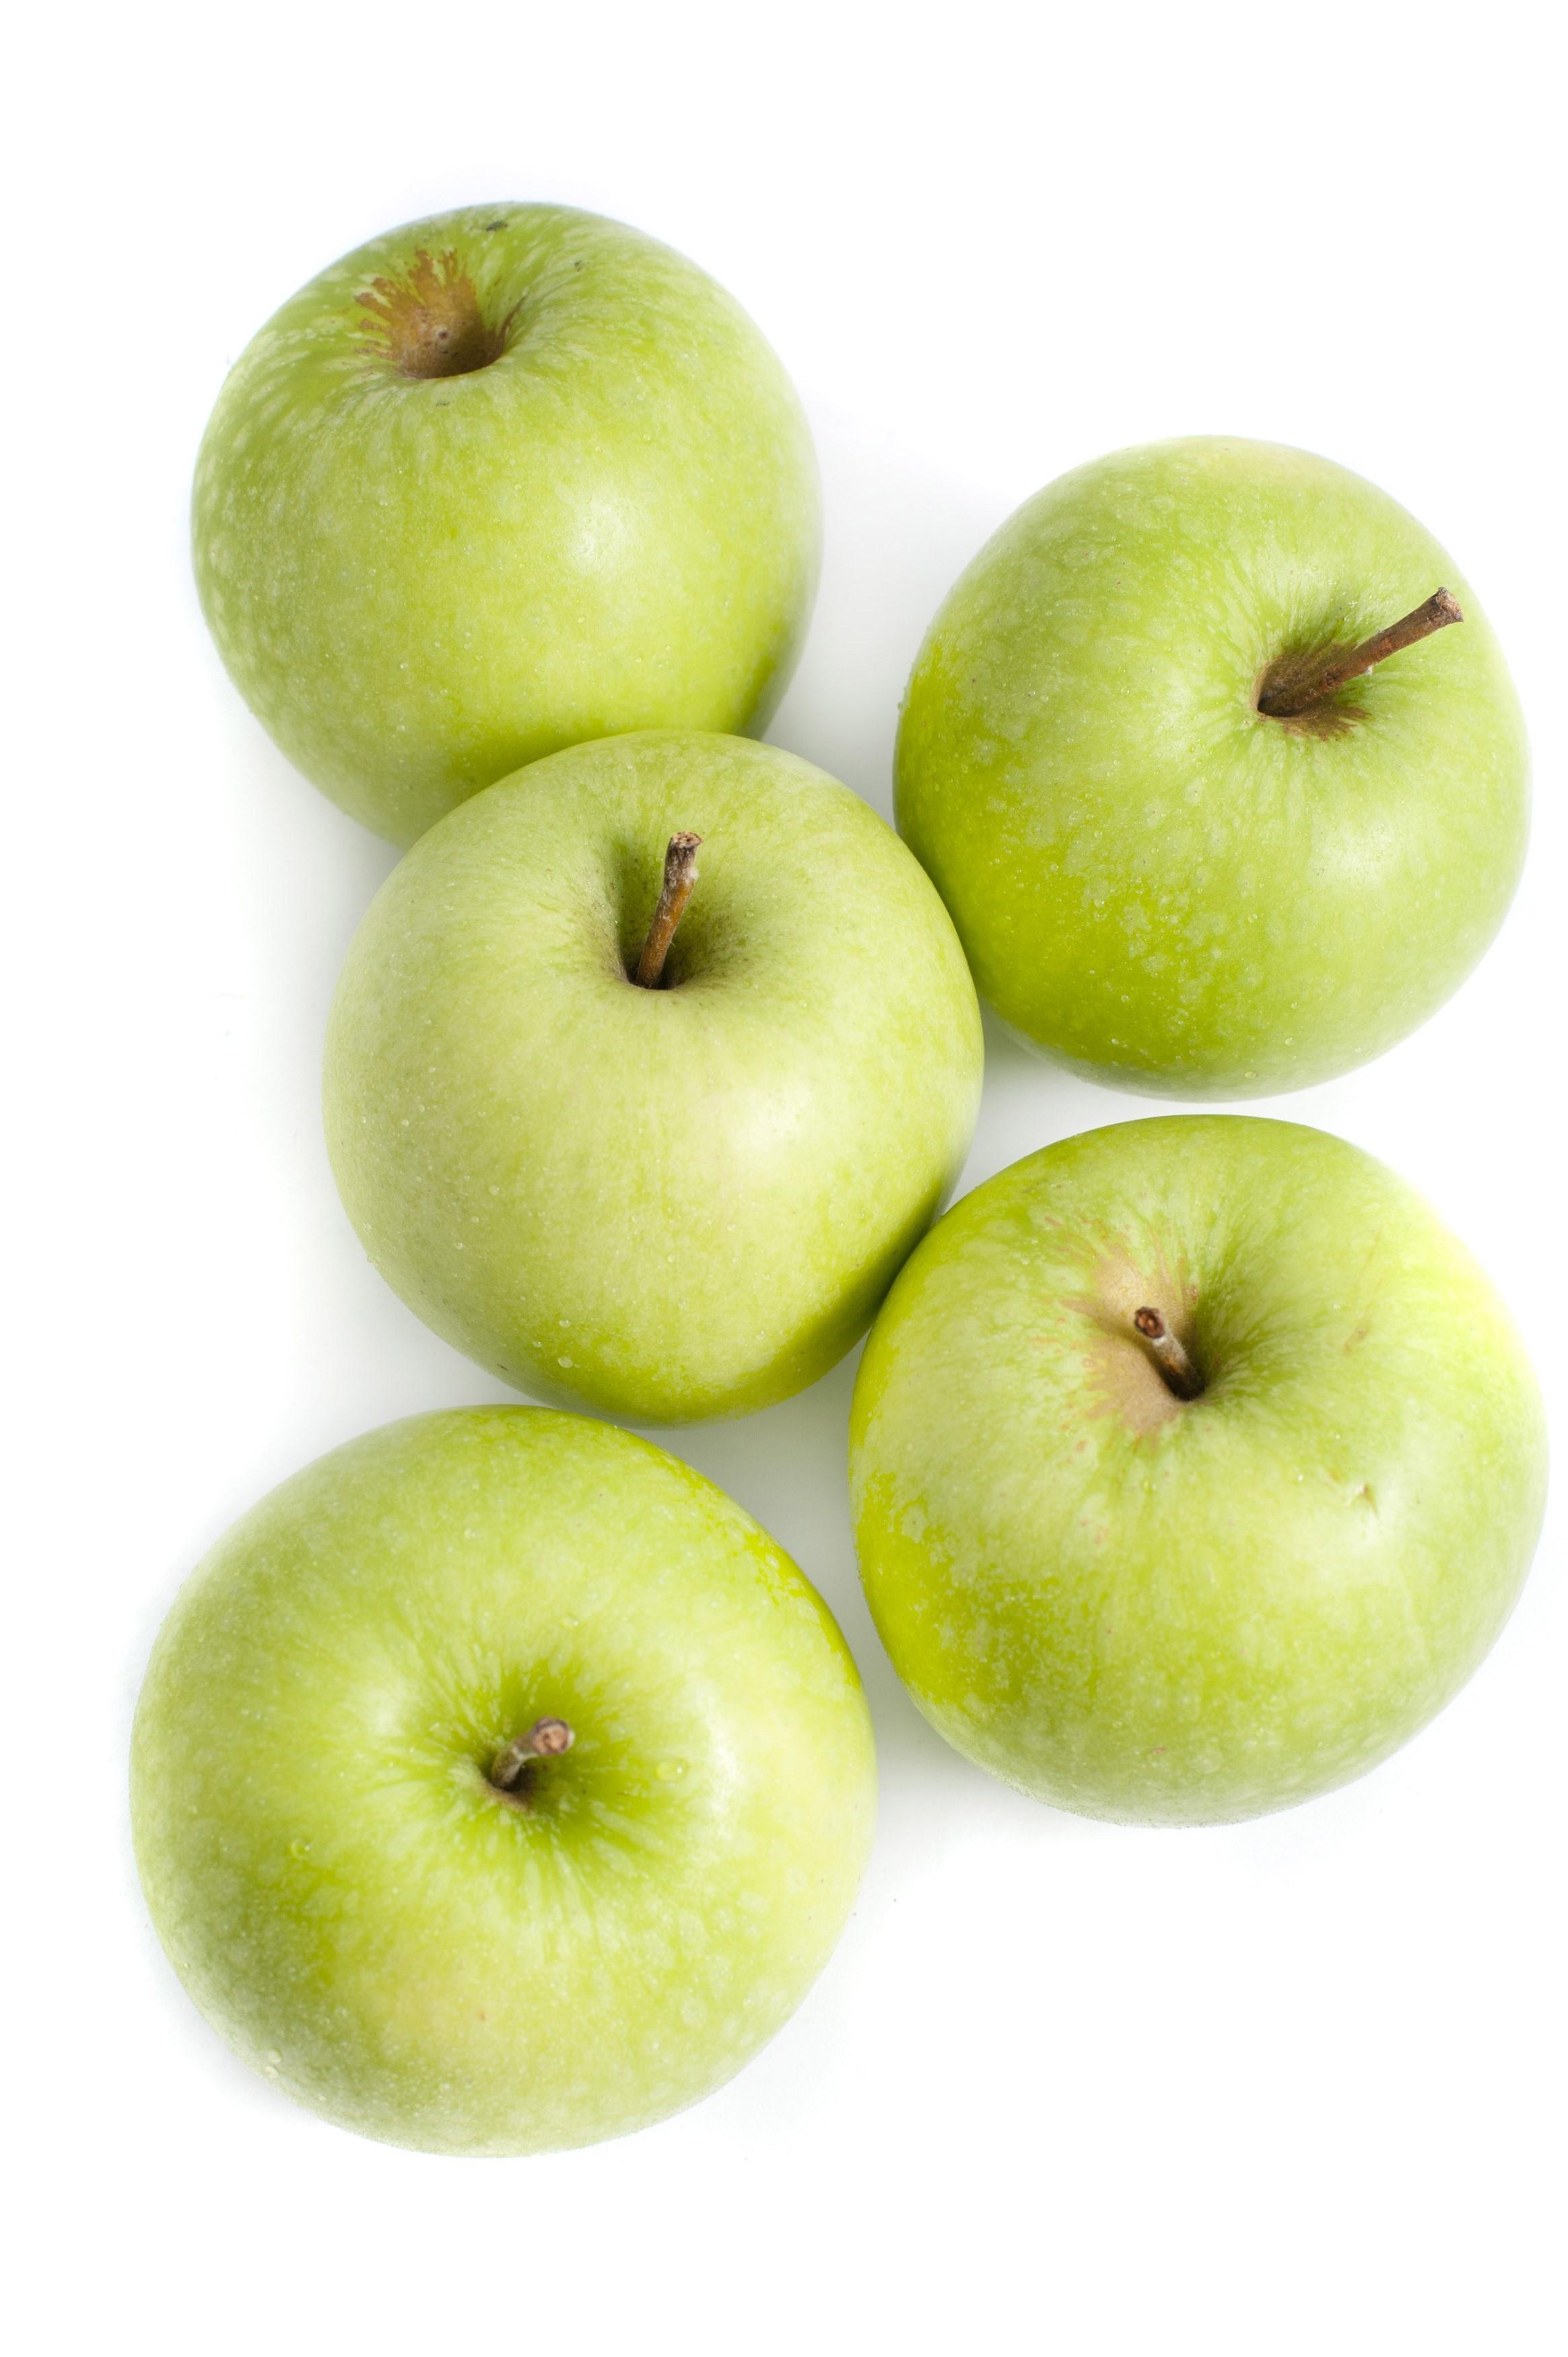 Five crisp healthy green apples - Free Stock Image